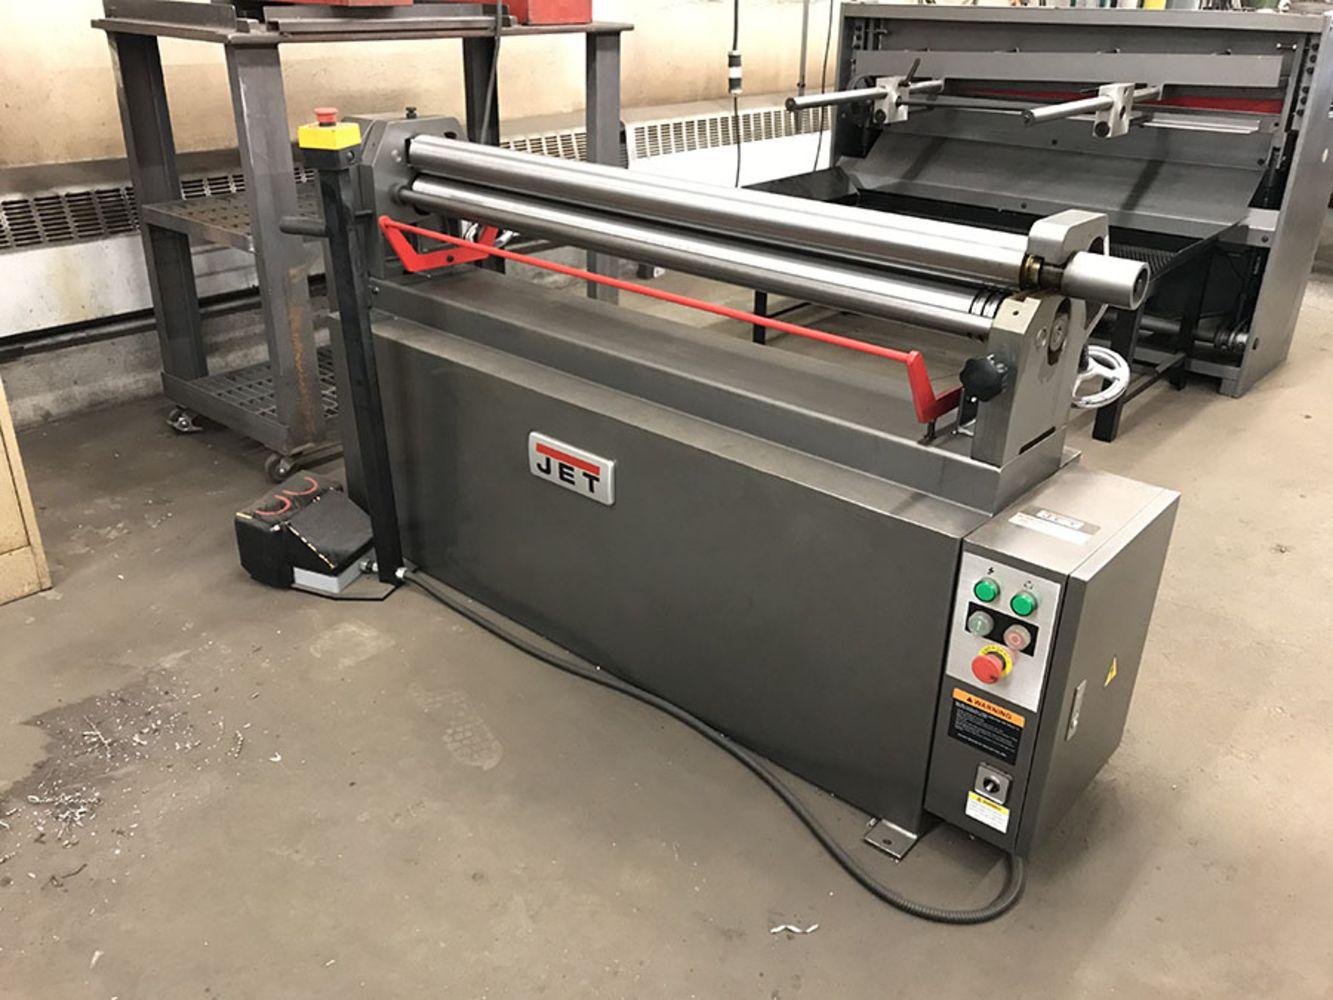 NORTHWEST FABRICATION, INC. - Fabricating & Toolroom Equipment